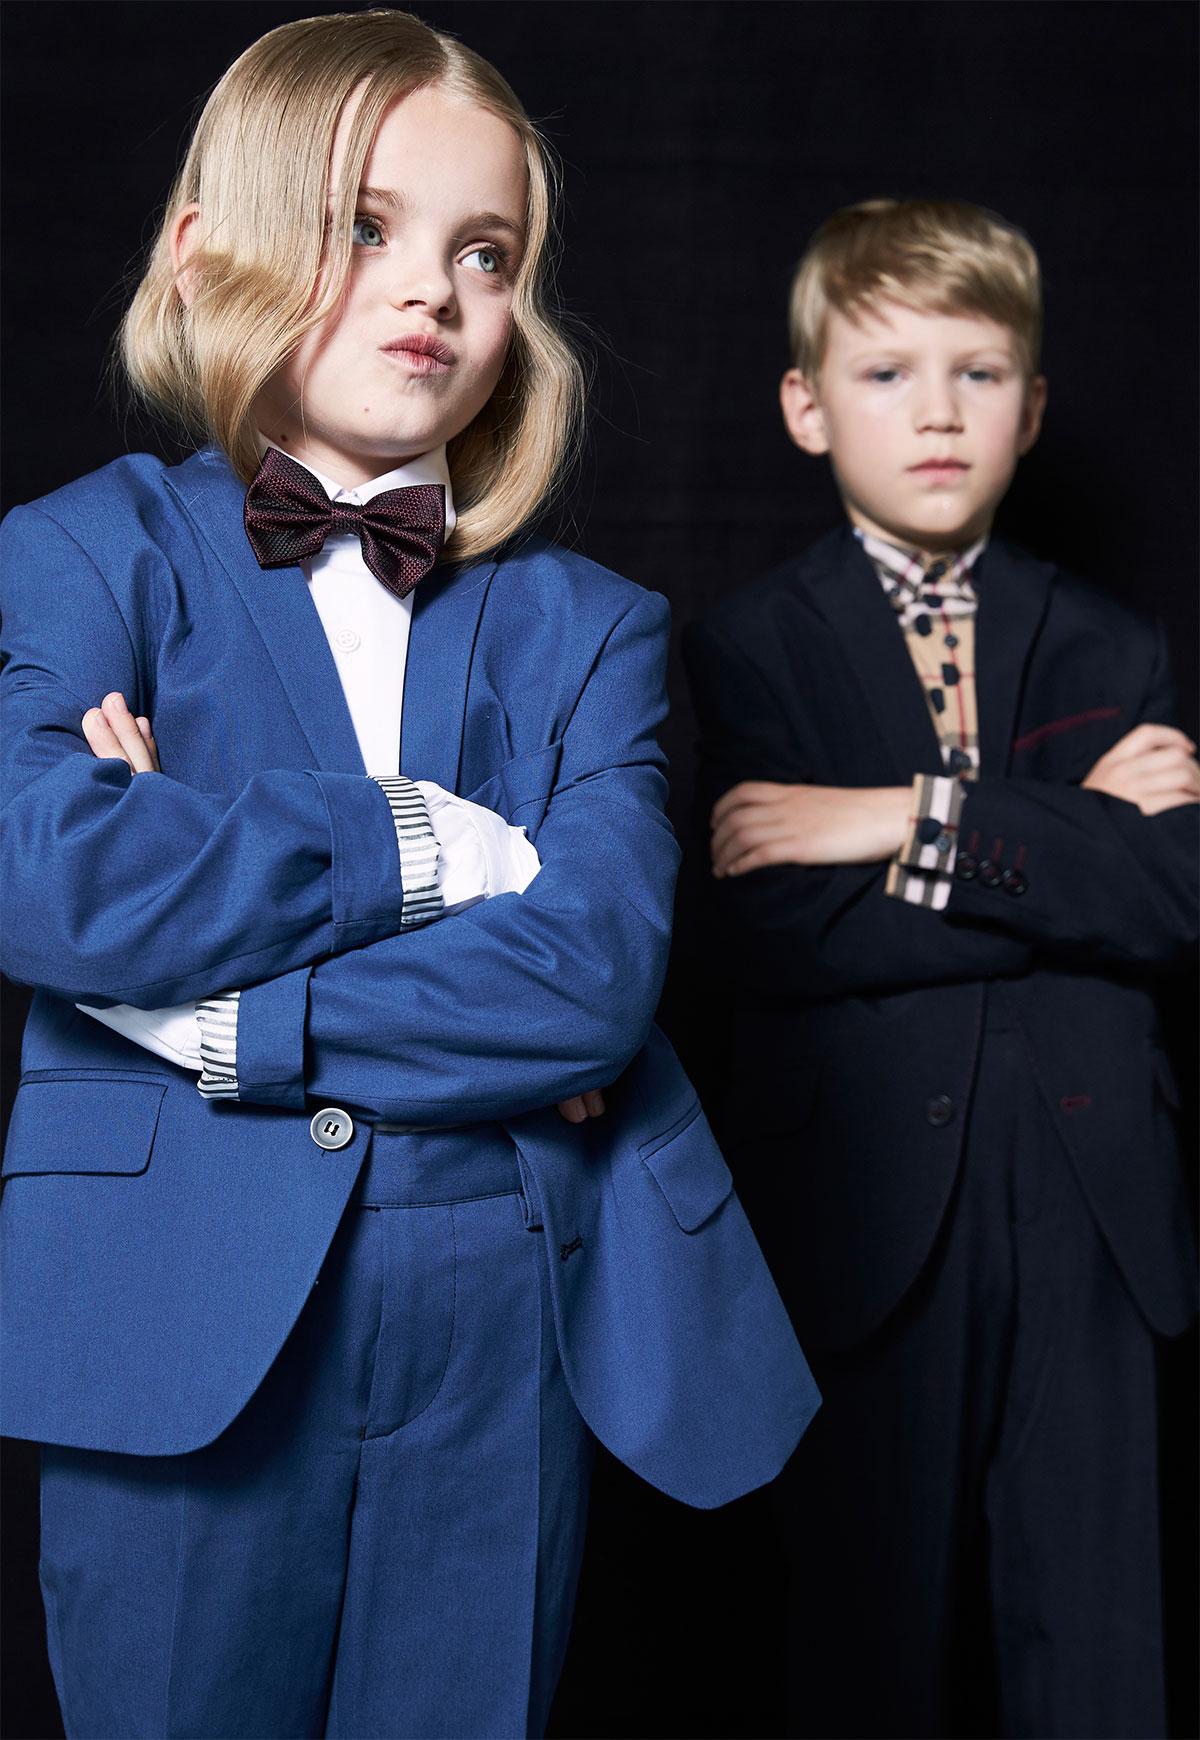 children formely dressed